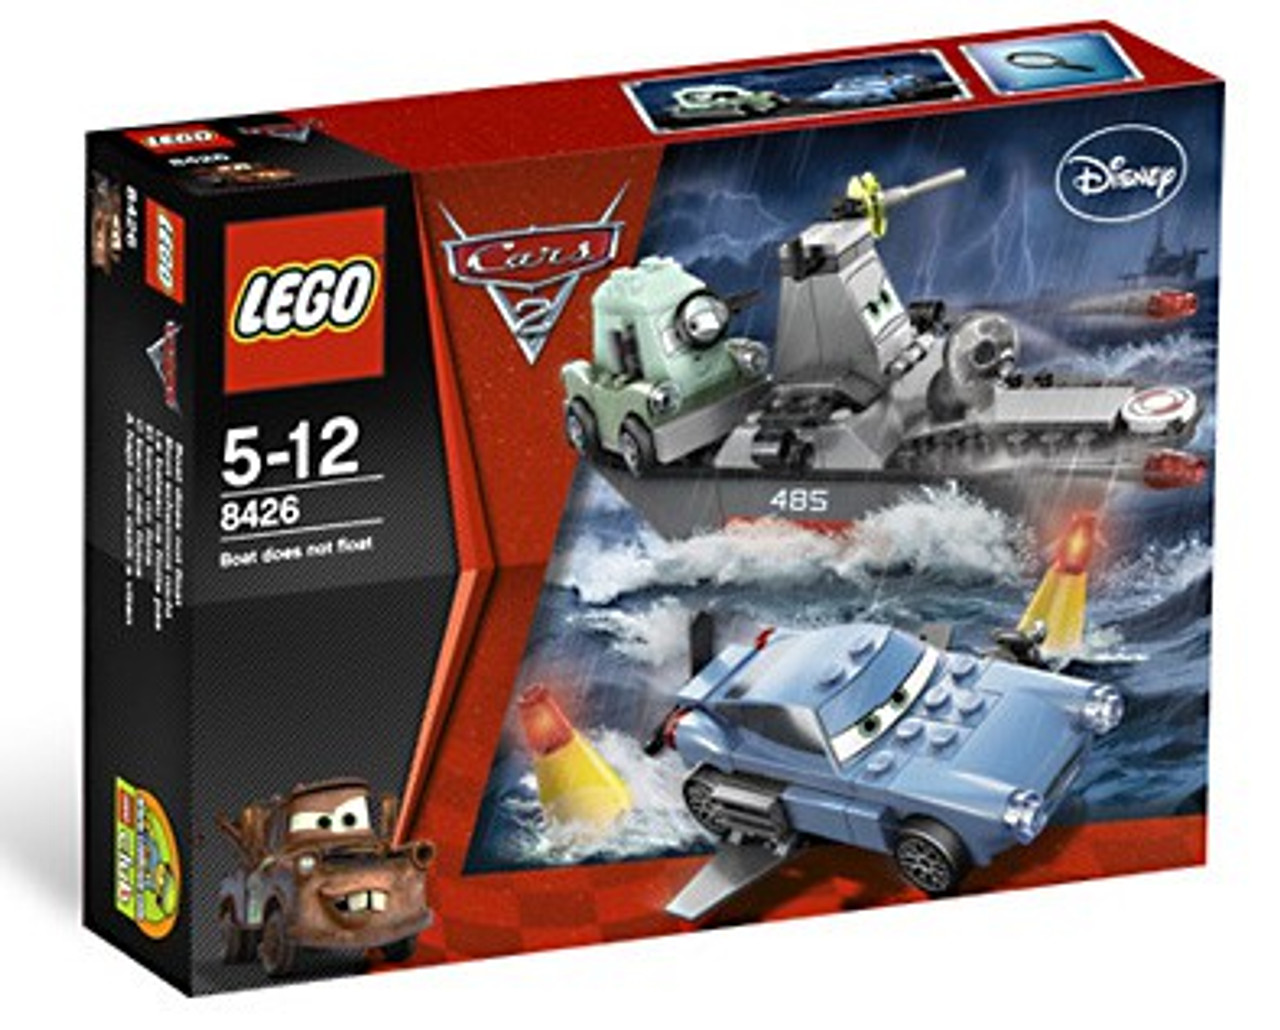 LEGO Disney Cars Cars 2 Escape at Sea Set #8426